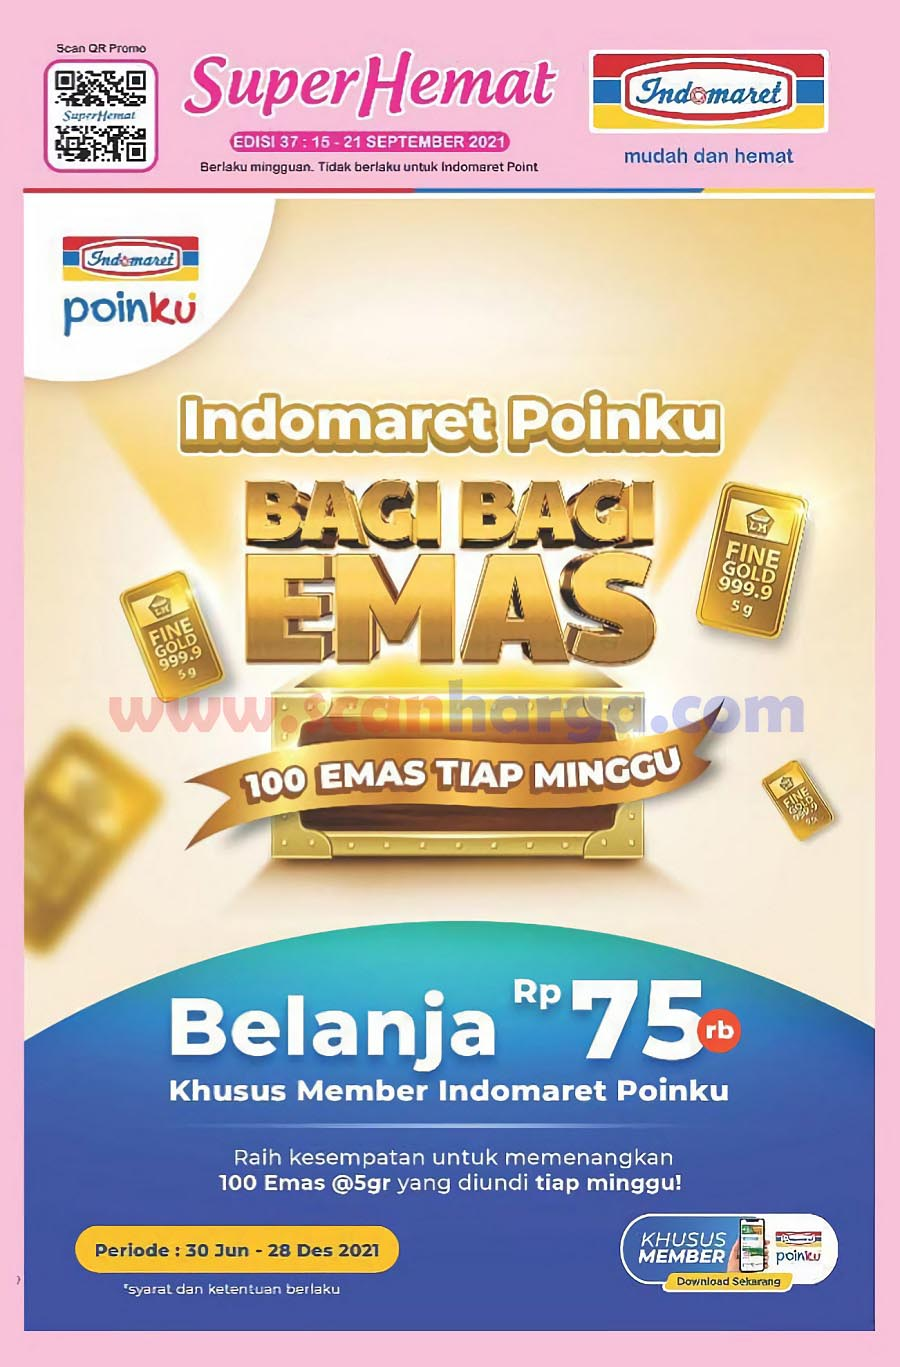 Katalog Indomaret Promo Terbaru 15 - 21 September 2021